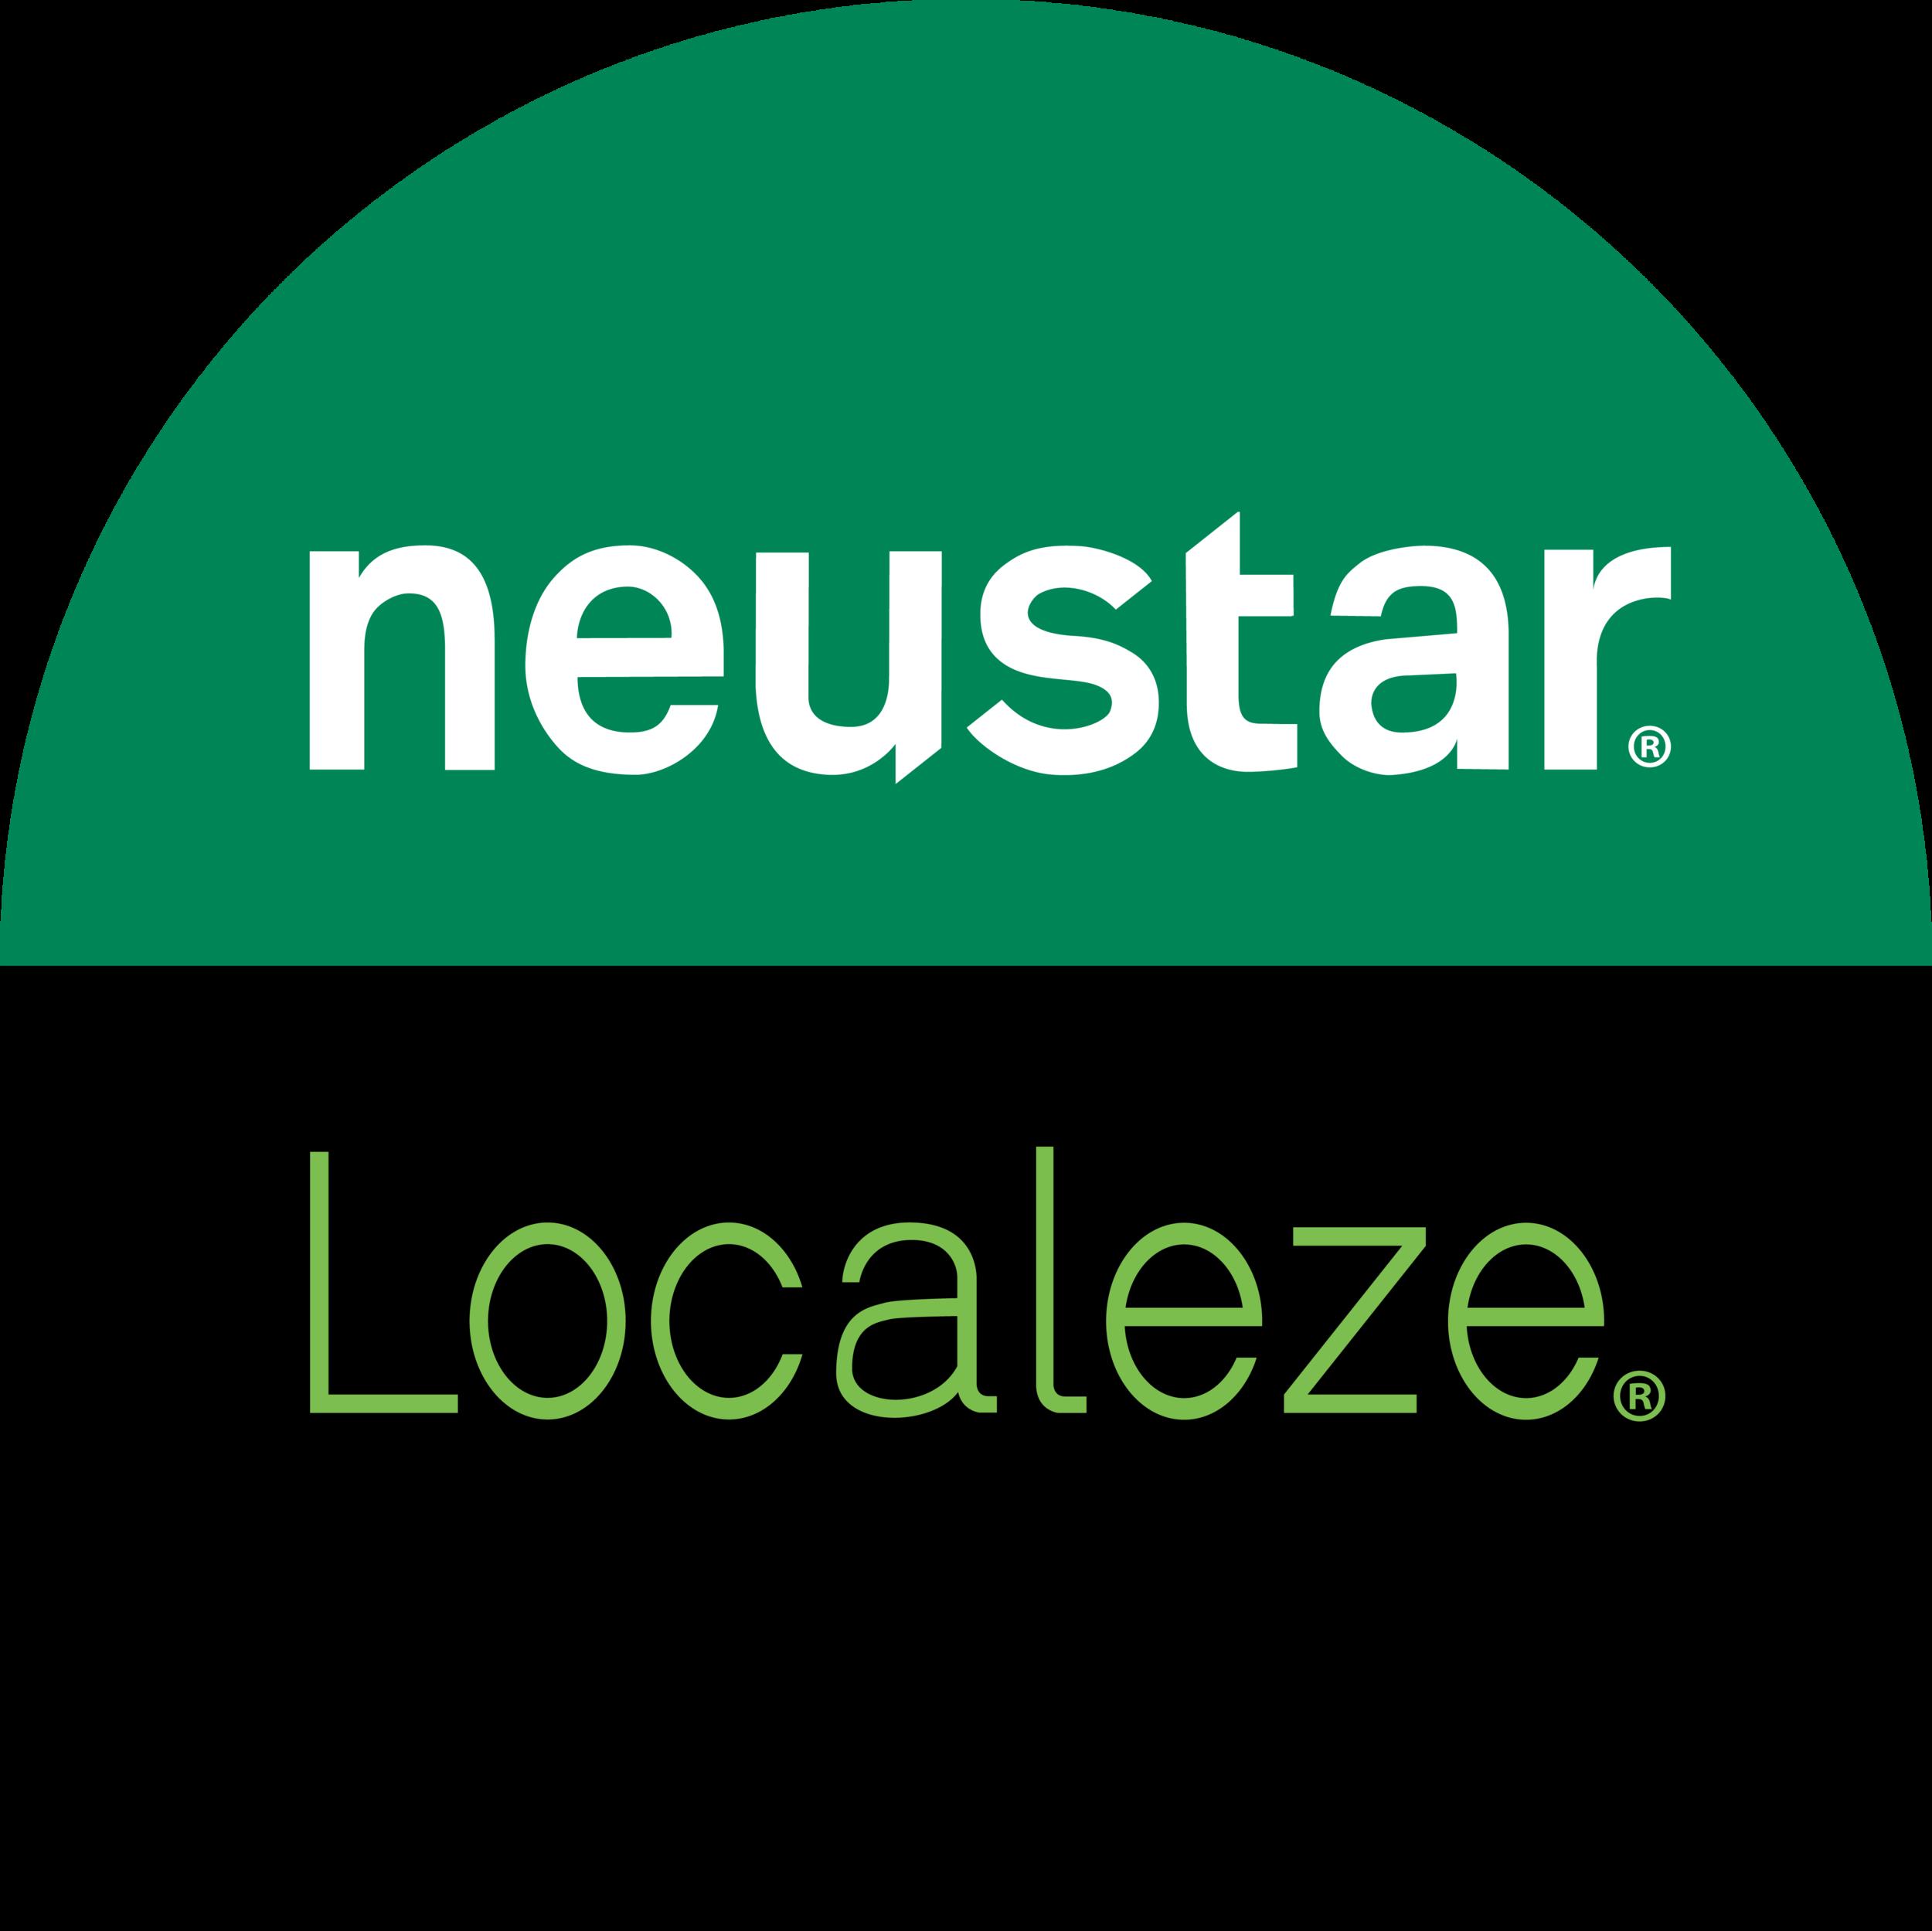 neustar-localeze.png